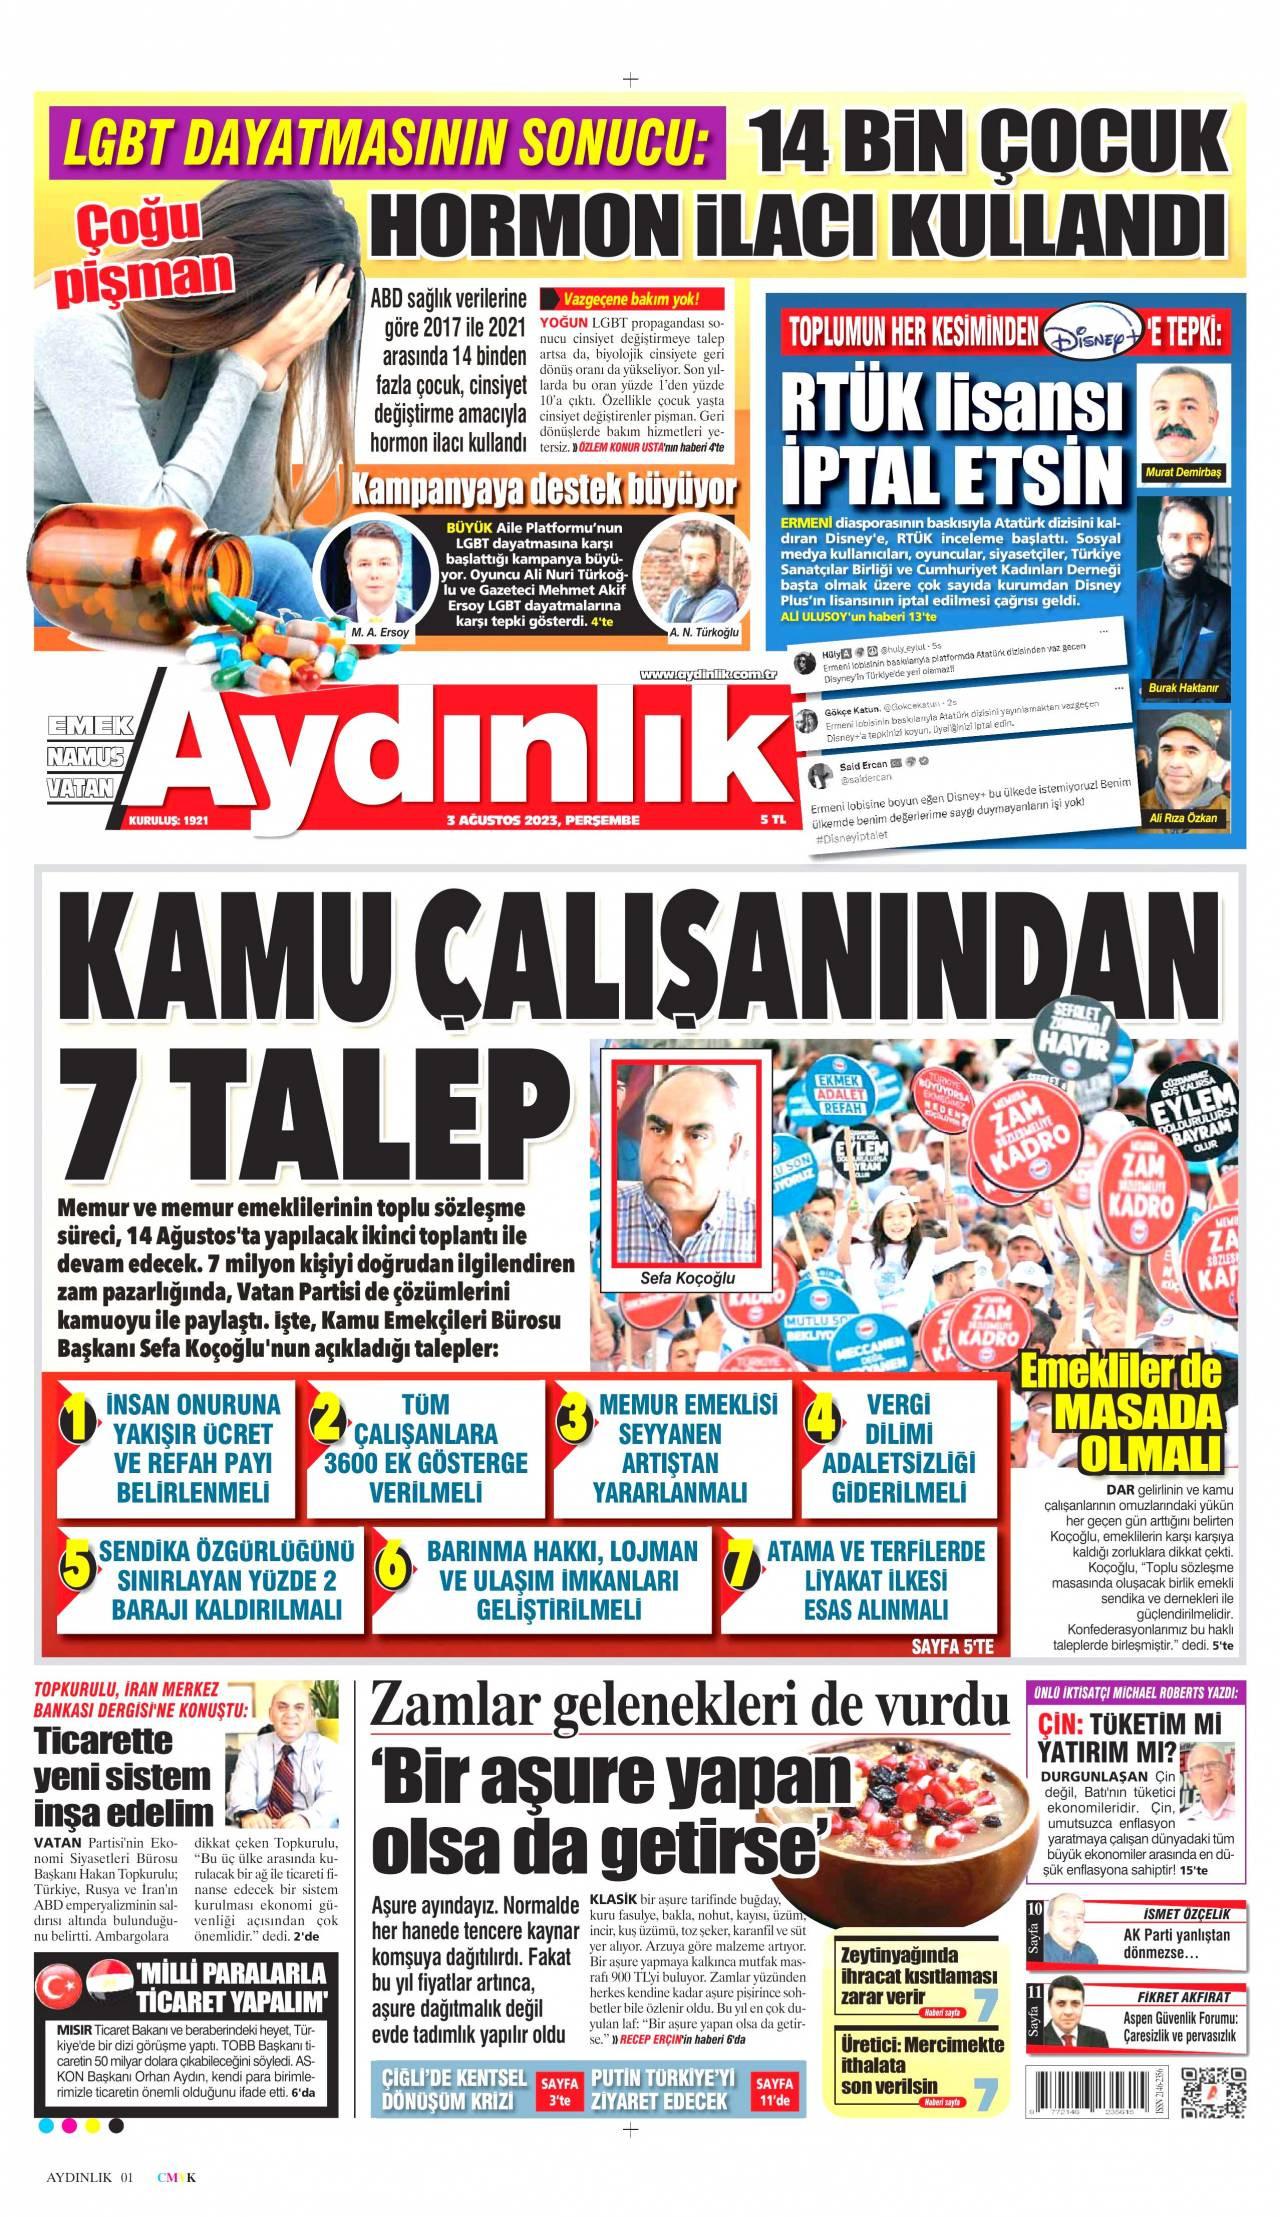 Gazete Manşetleri 28 Mart 2019 Perşembe Kdz Ereğli Haber